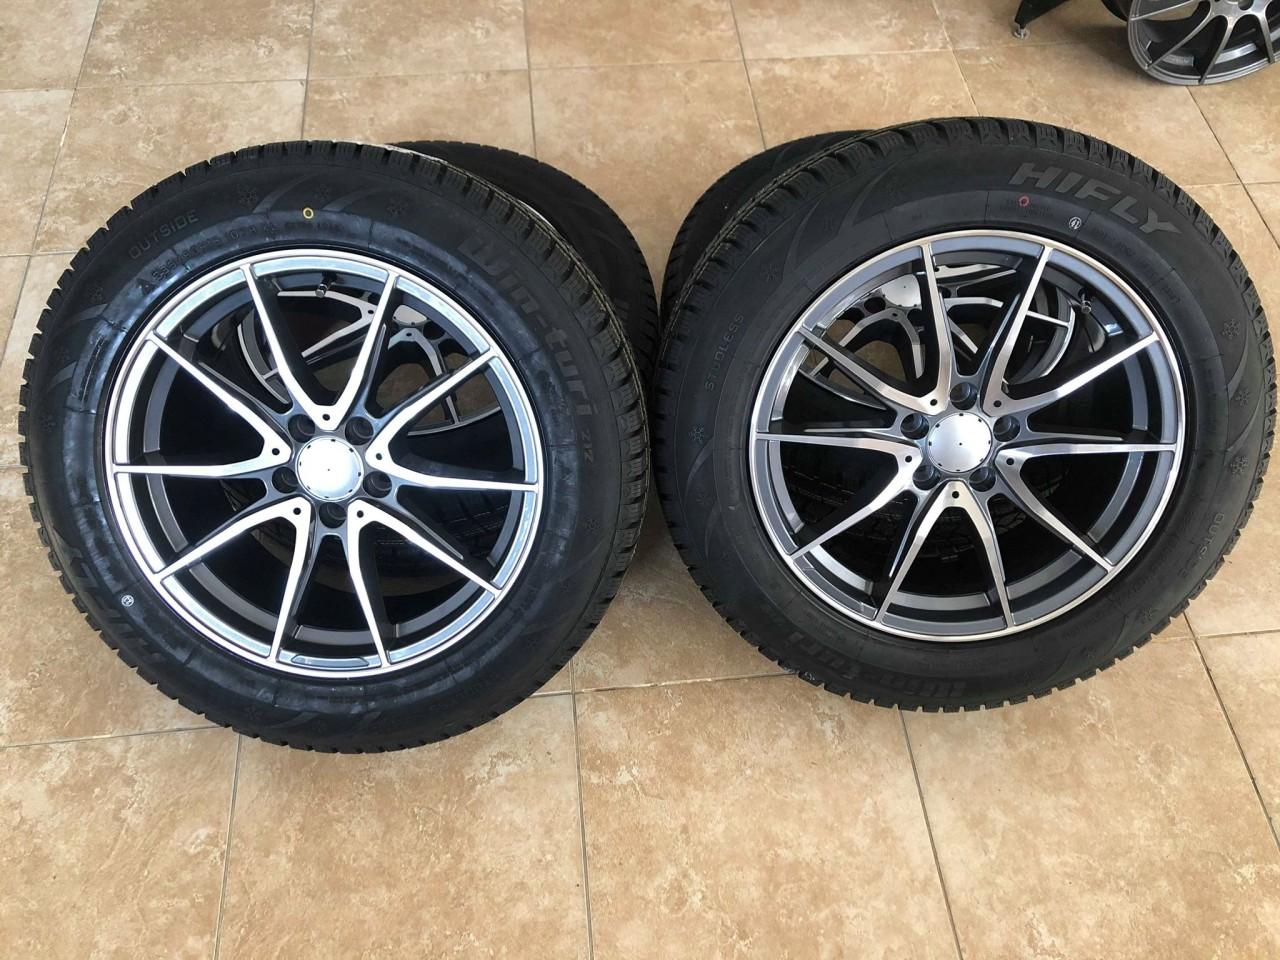 Jante Mercedes 18 R18 GLC anvelope iarna 235-60-18 dot 2019